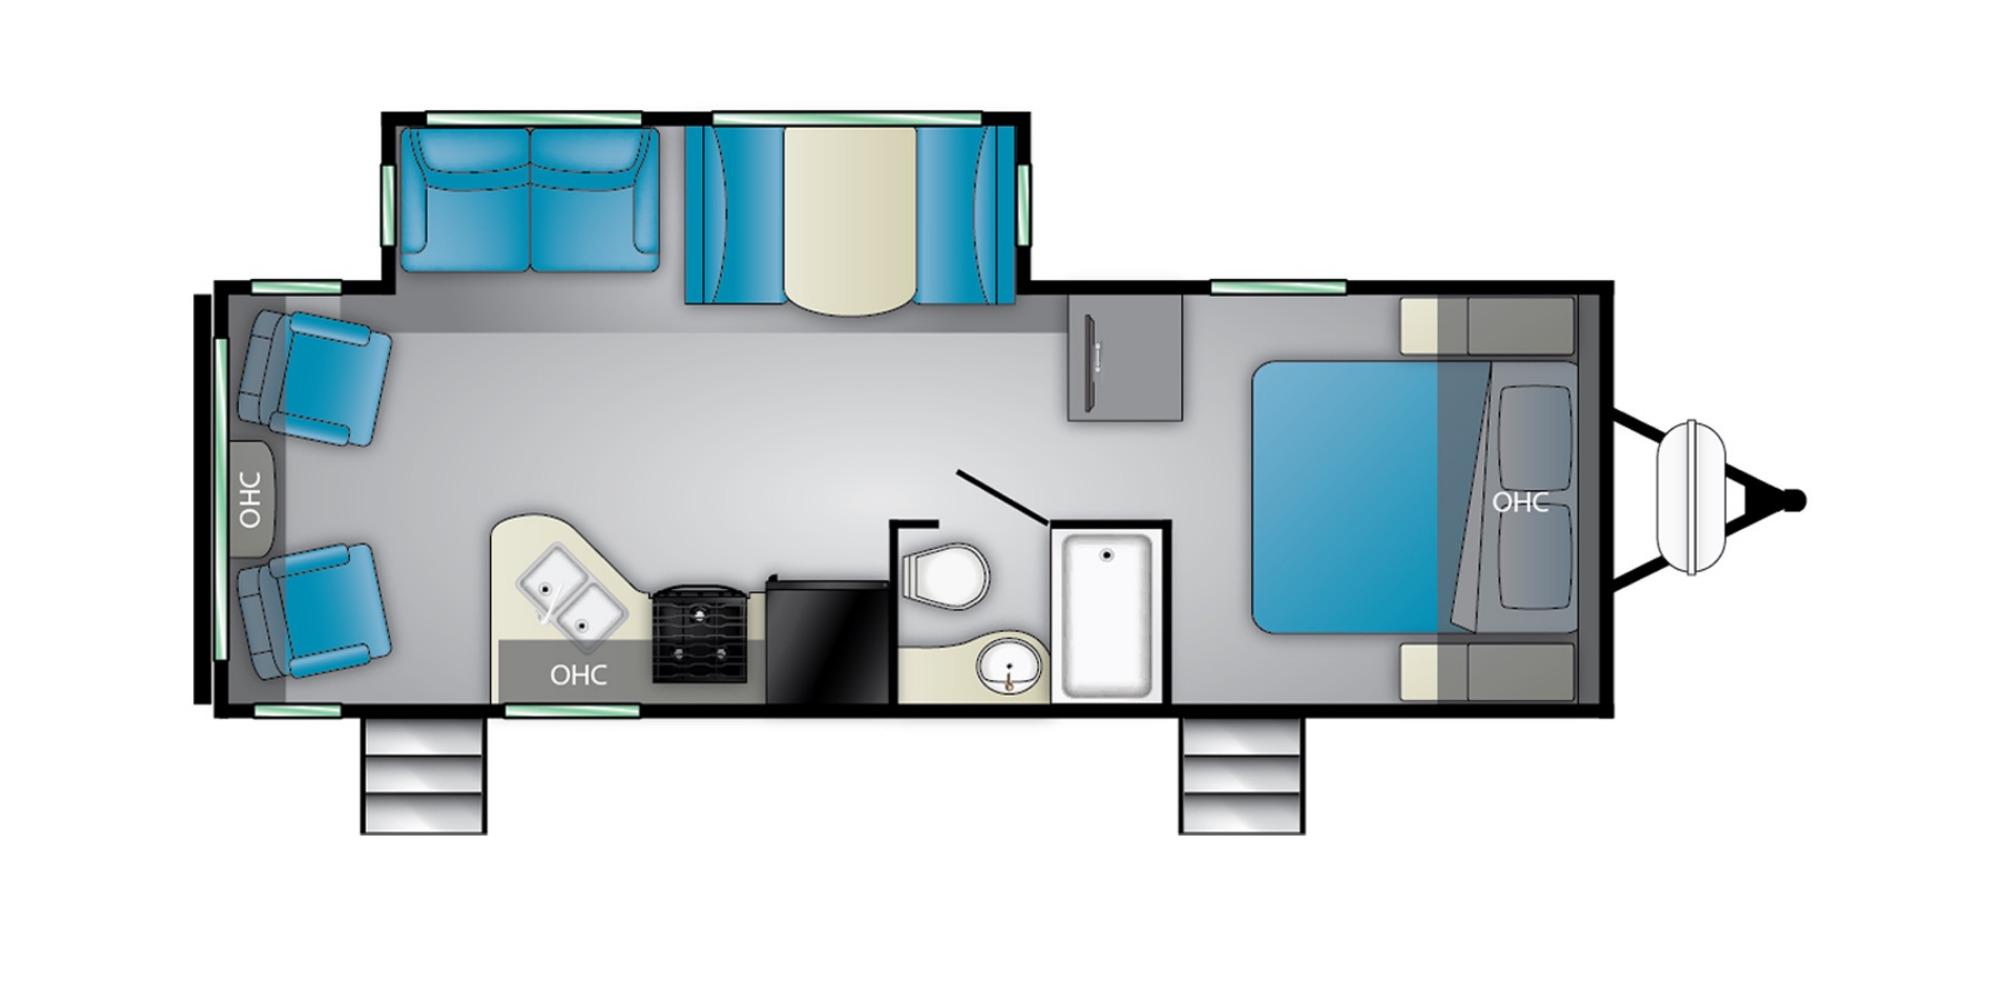 View Floor Plan for 2022 HEARTLAND MALLARD M27